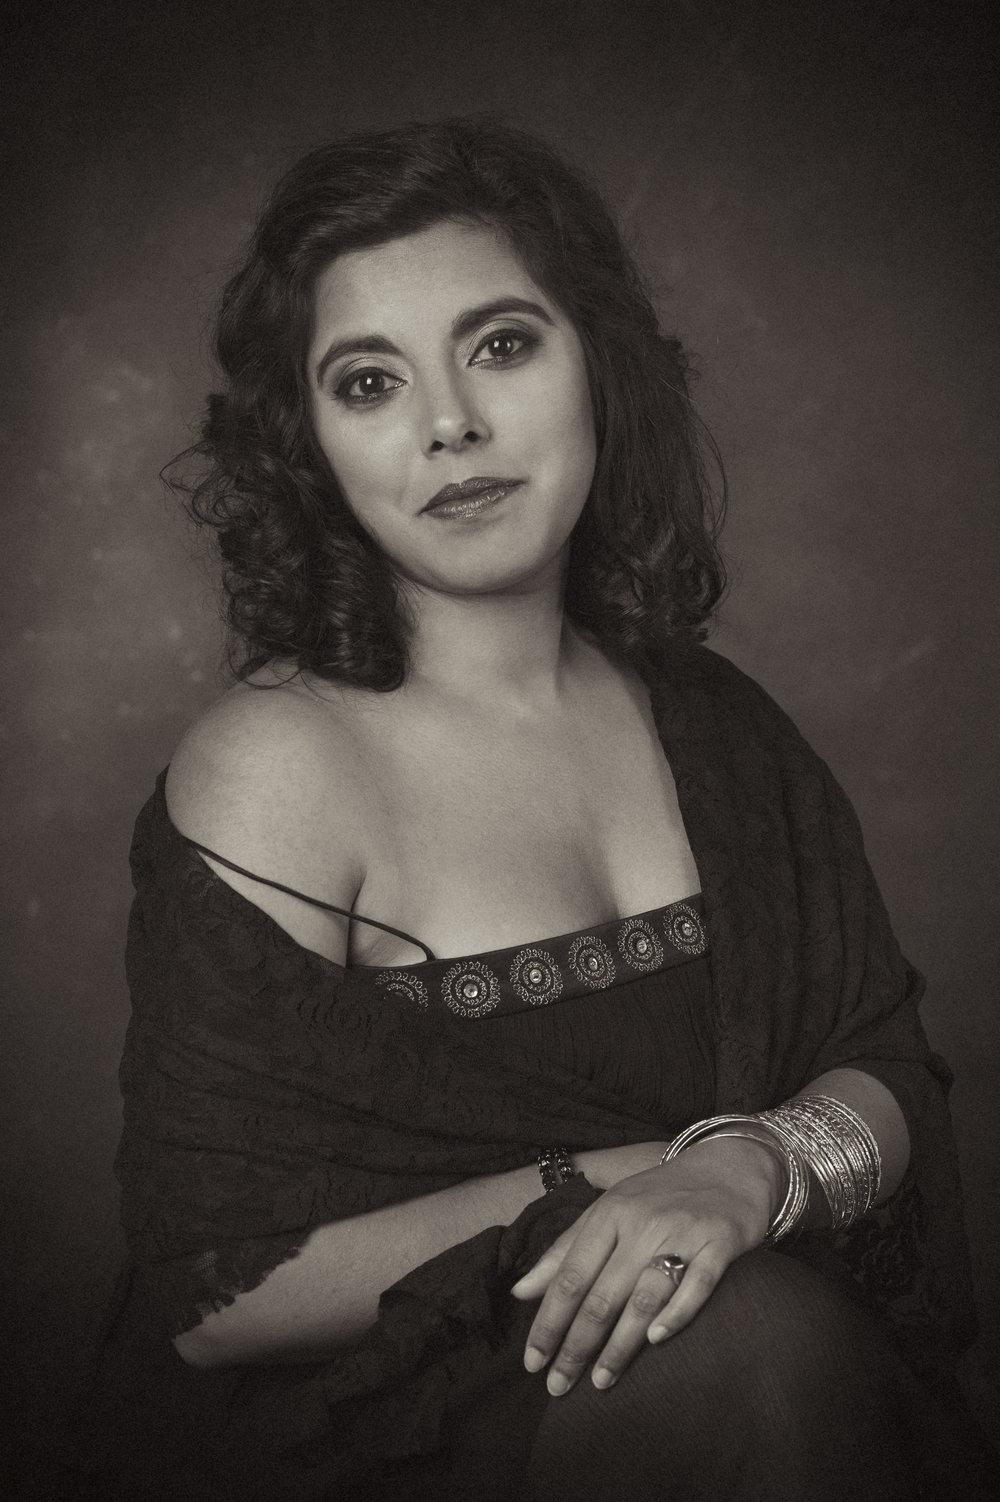 Marta-Hewson-Classical-portrait-ethnic-sepia-tone.jpg